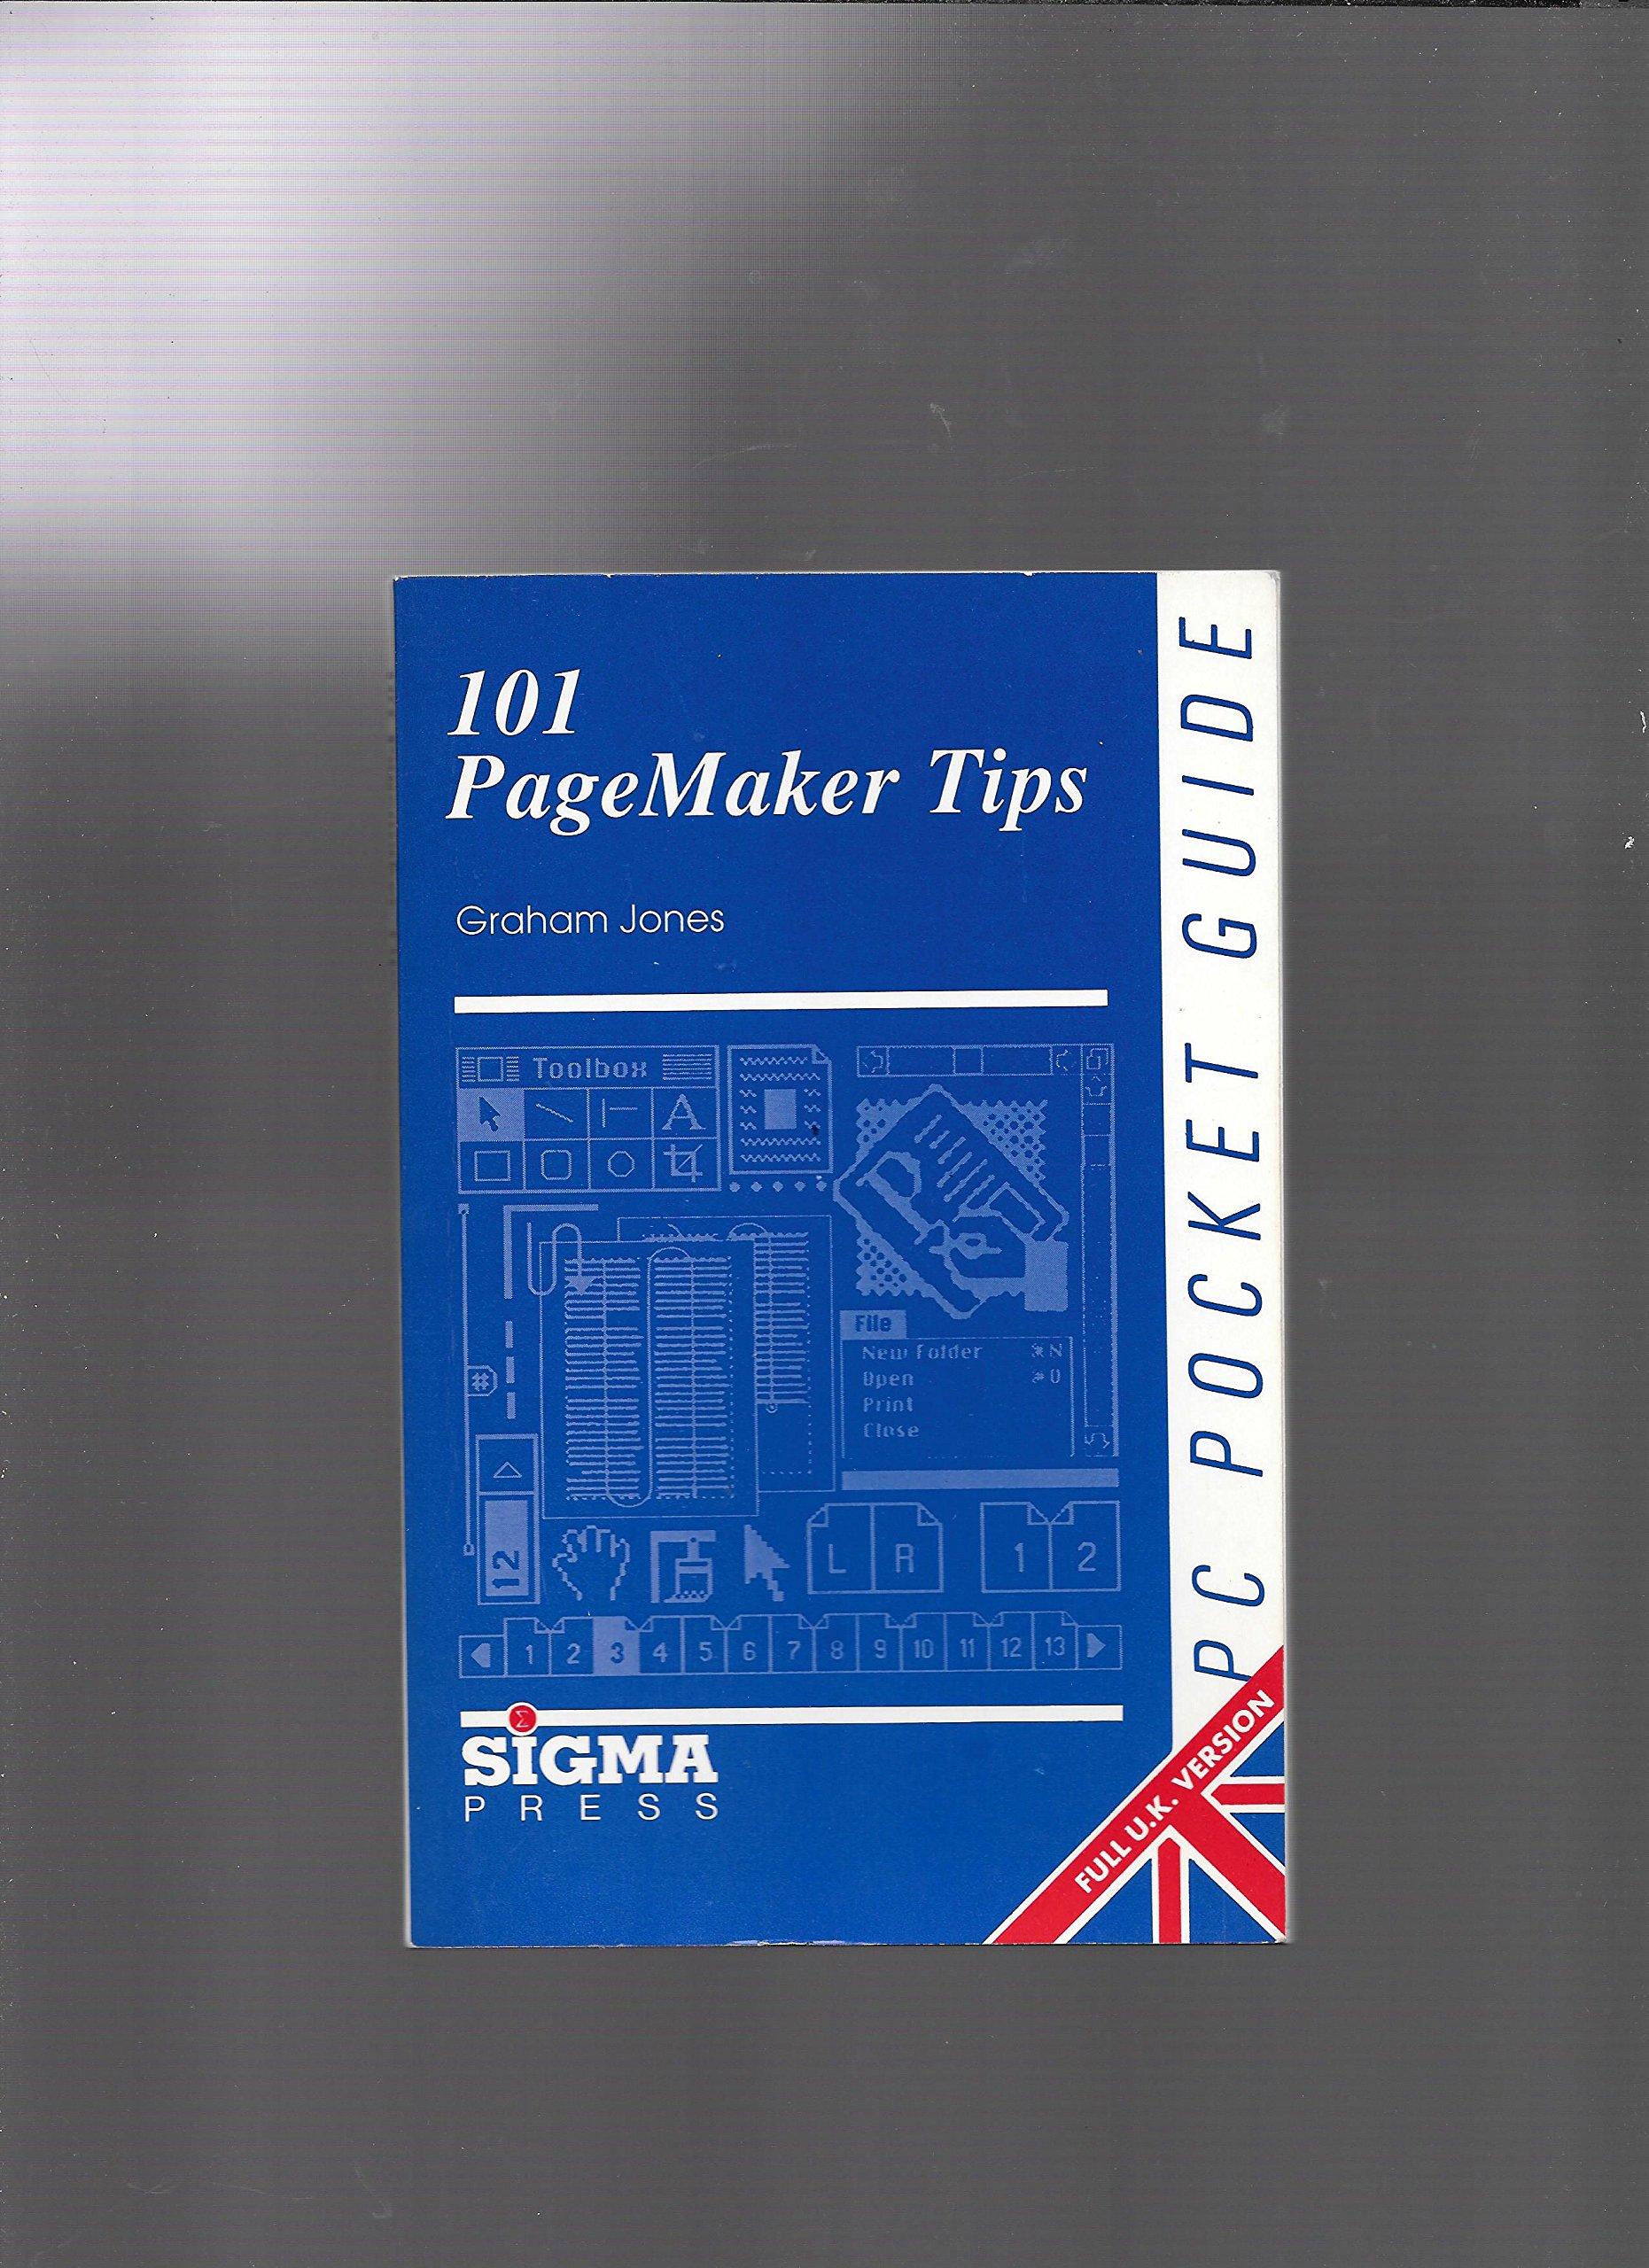 Personal Computer Pocket Guide: 101 Pagemaker Tips (PC pocket guides):  Graham Jones: 9781850582007: Amazon.com: Books